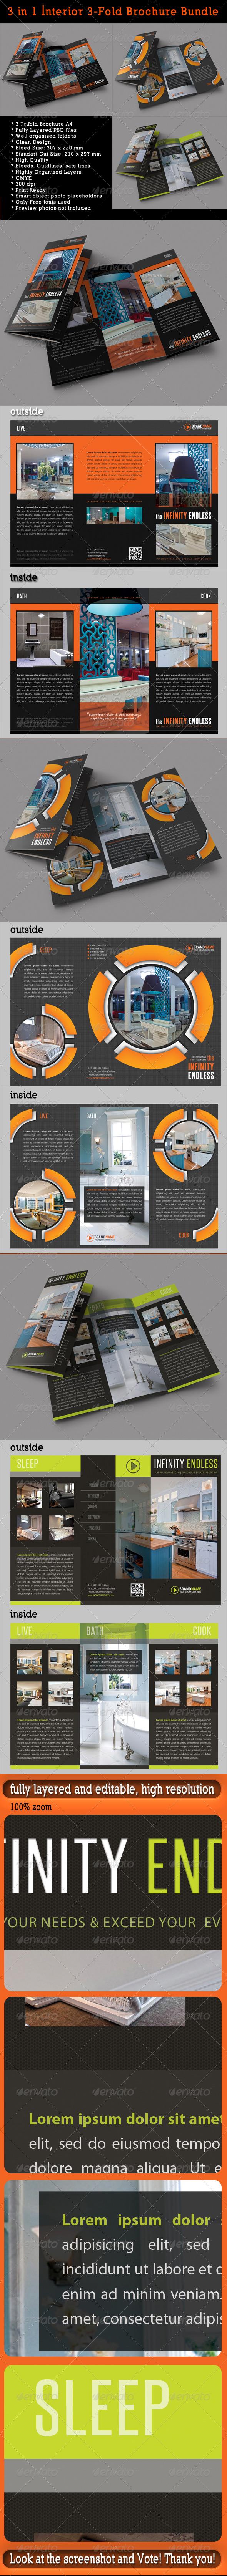 GraphicRiver 3 in 1 Interior 3-Fold Brochure Bundle 02 7930118